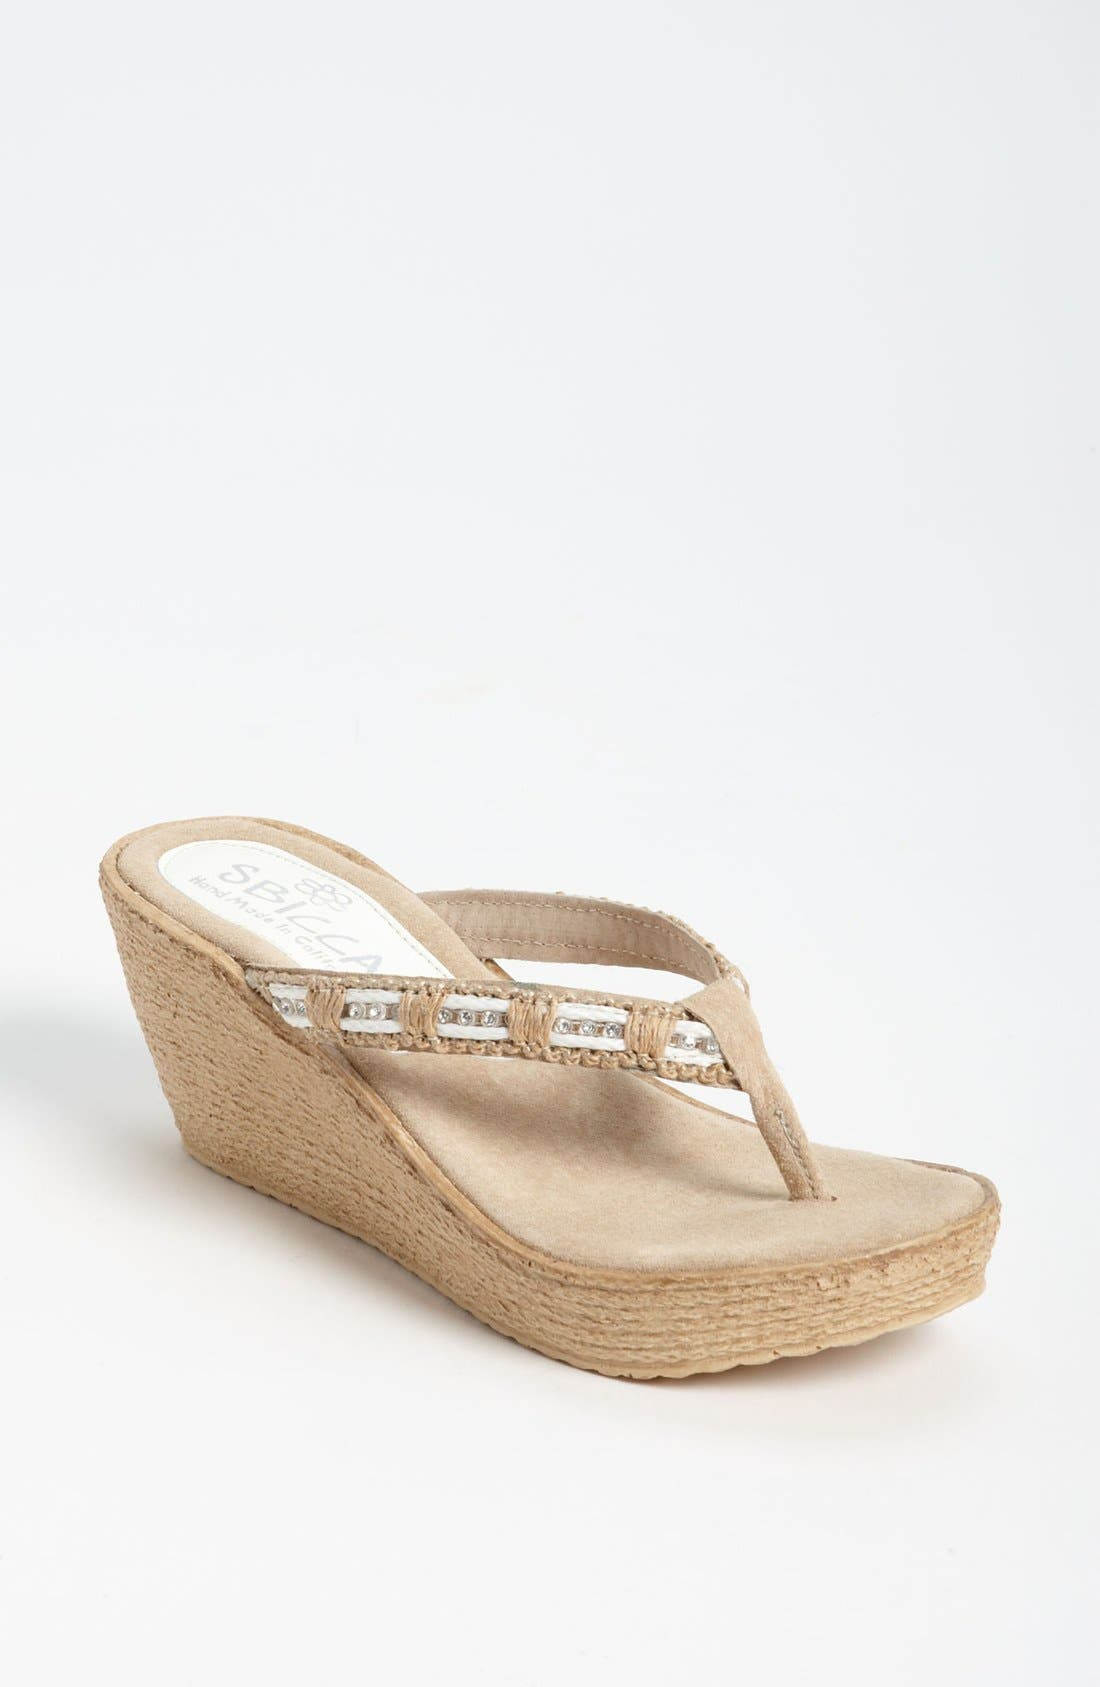 Main Image - Sbicca 'Cora' Wedge Sandal